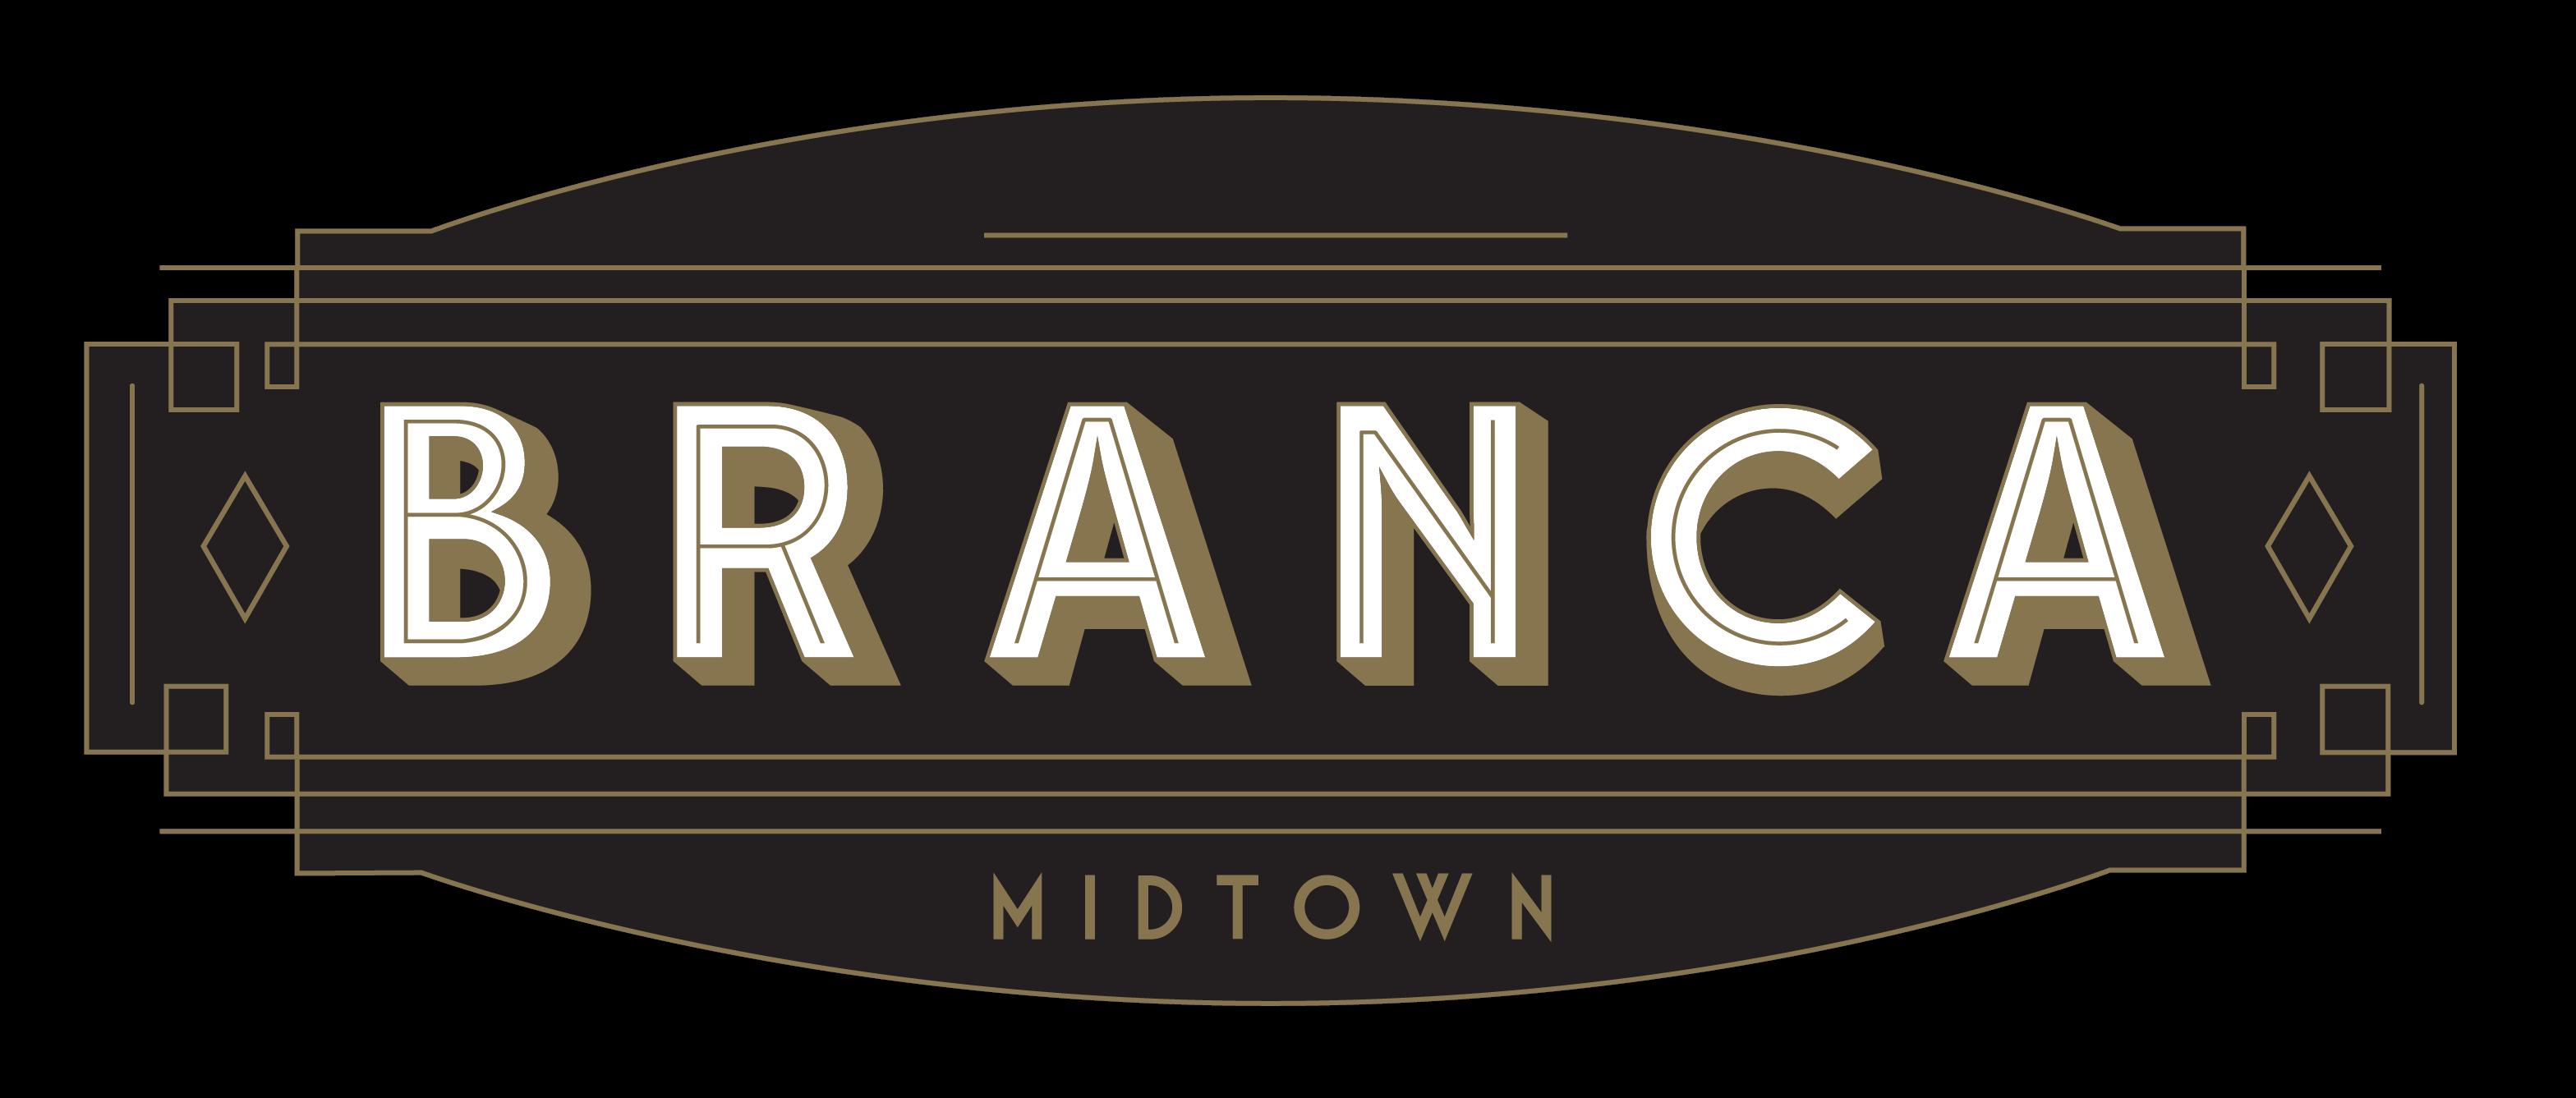 Branca Midtown